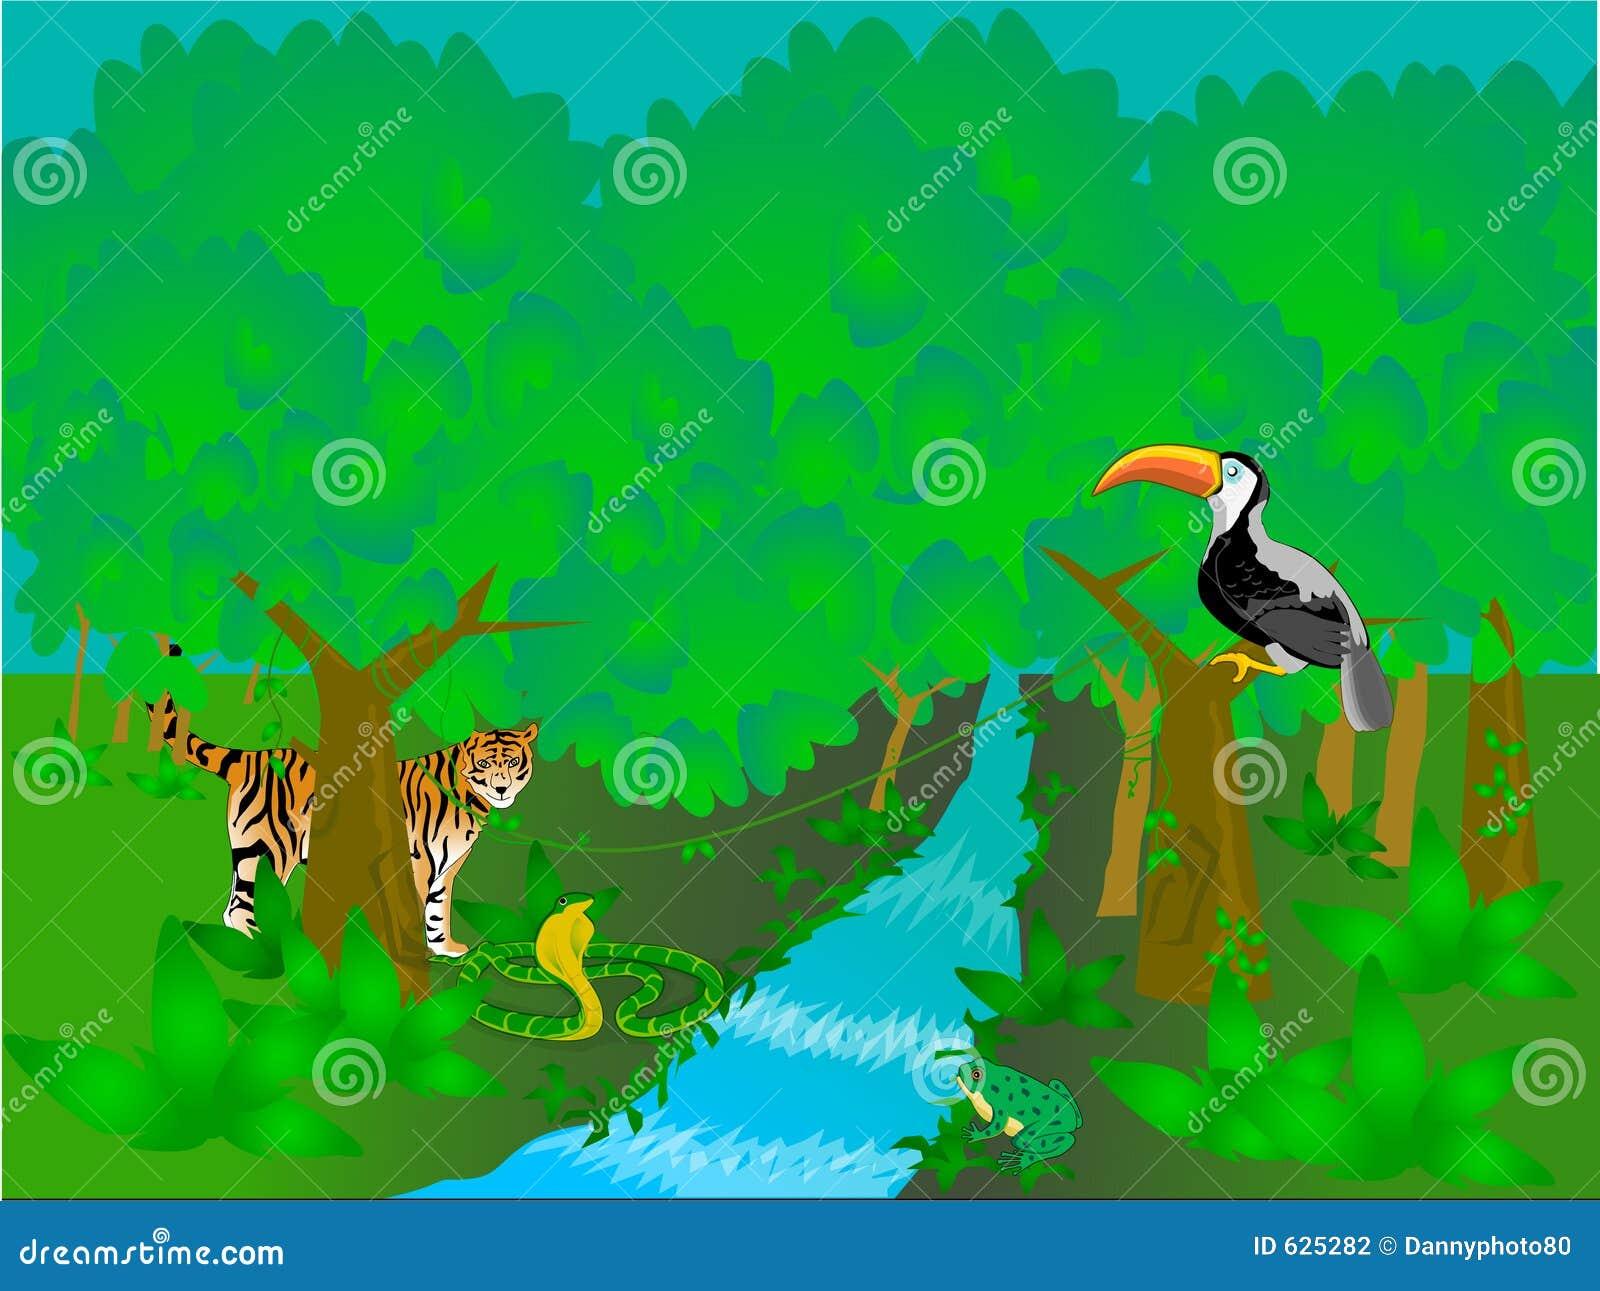 temperate rainforest clipart wwwimgkidcom the image